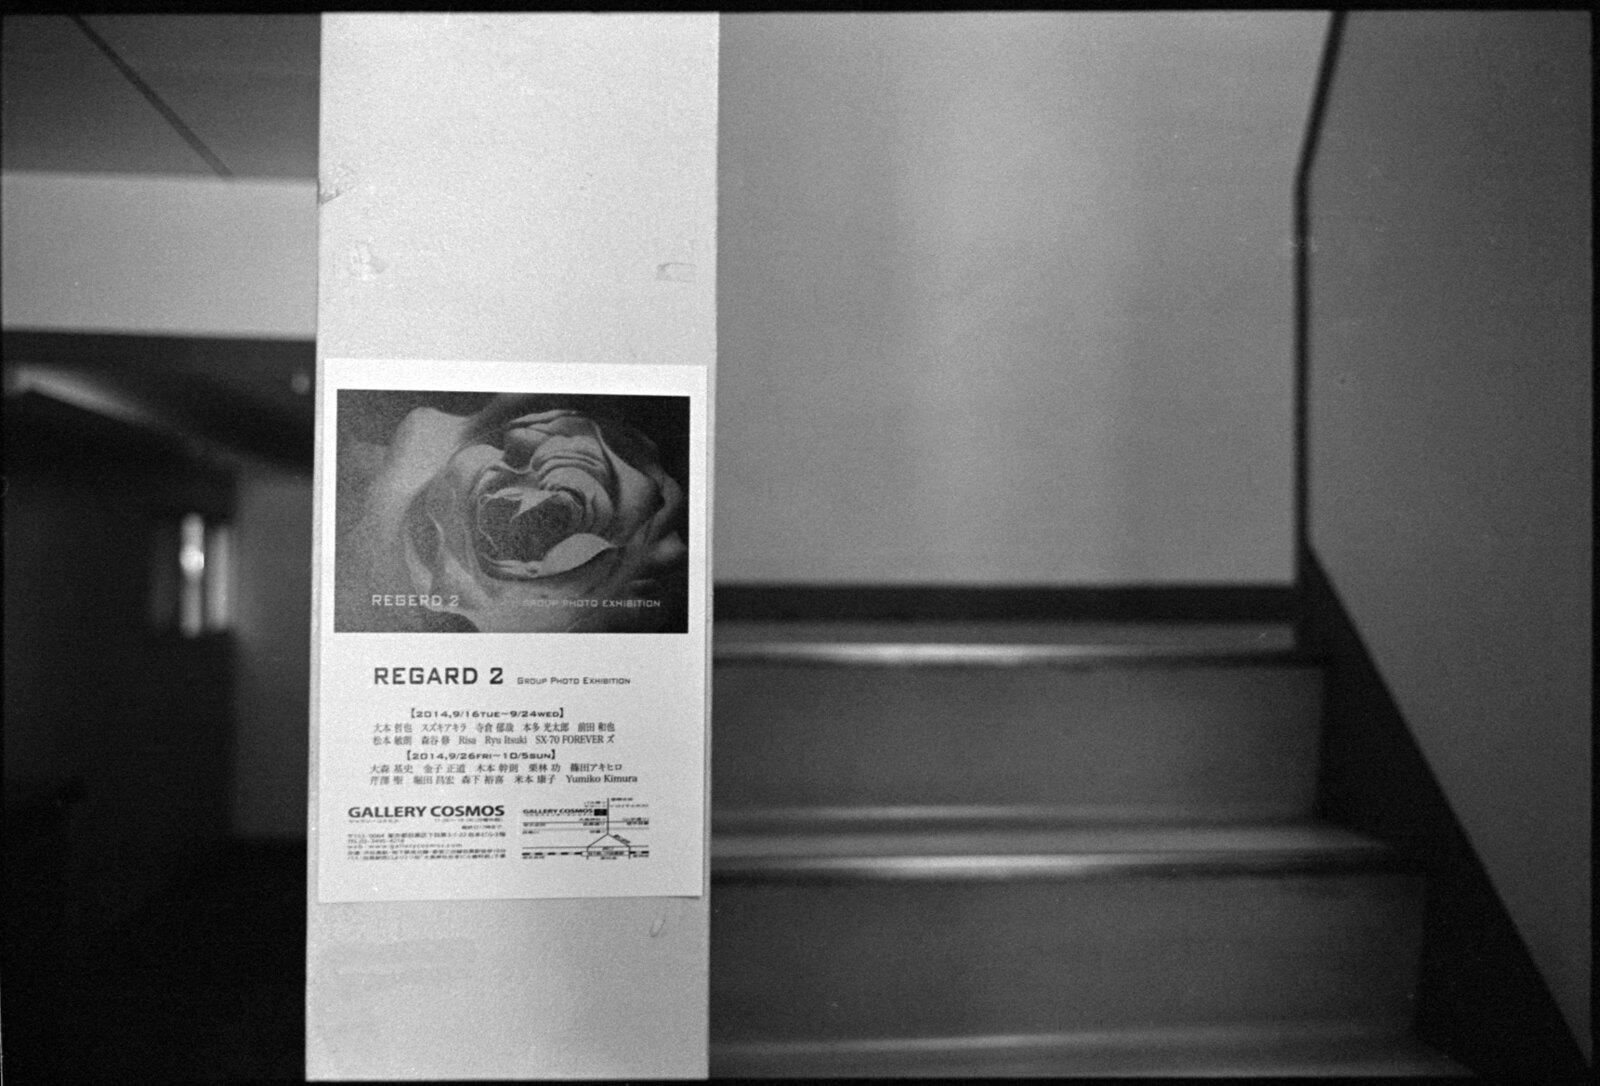 20140918 LeicaM4-P NoktonClassic35 400TX D76 019